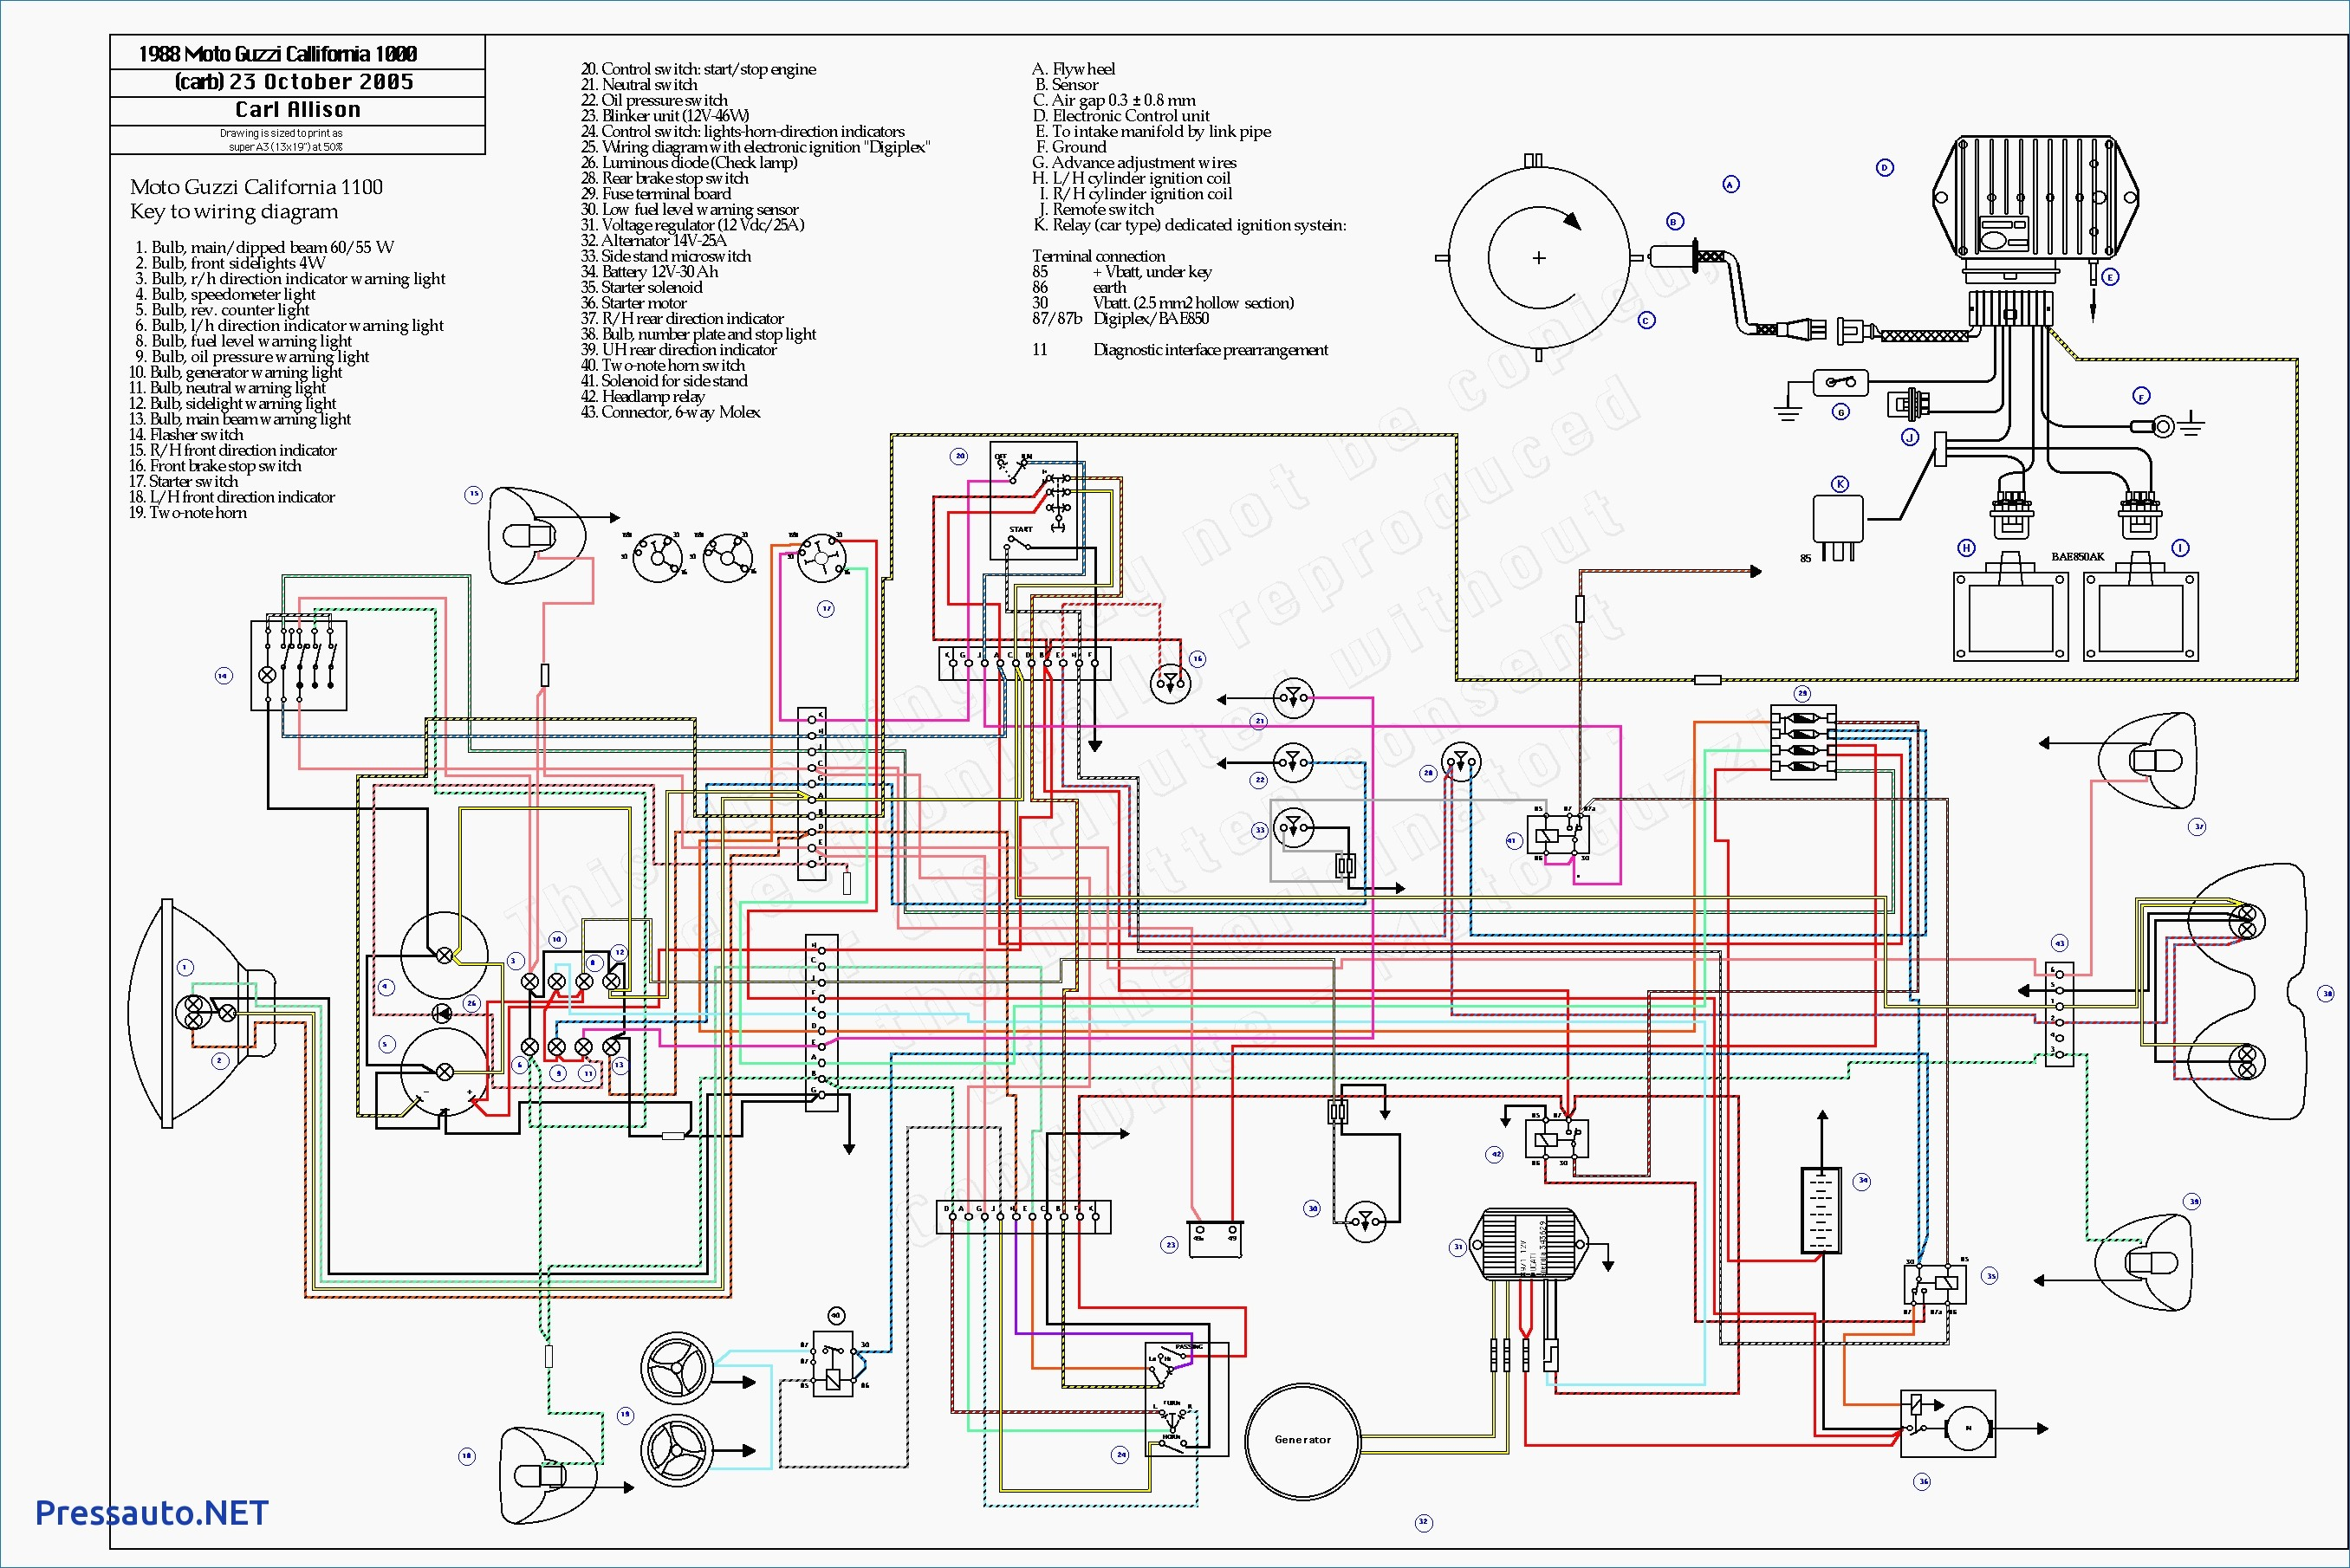 Nd 4762 Wiring Diagram Besides 1990 Toyota Corolla Wiring Diagram Besides Wiring Diagram